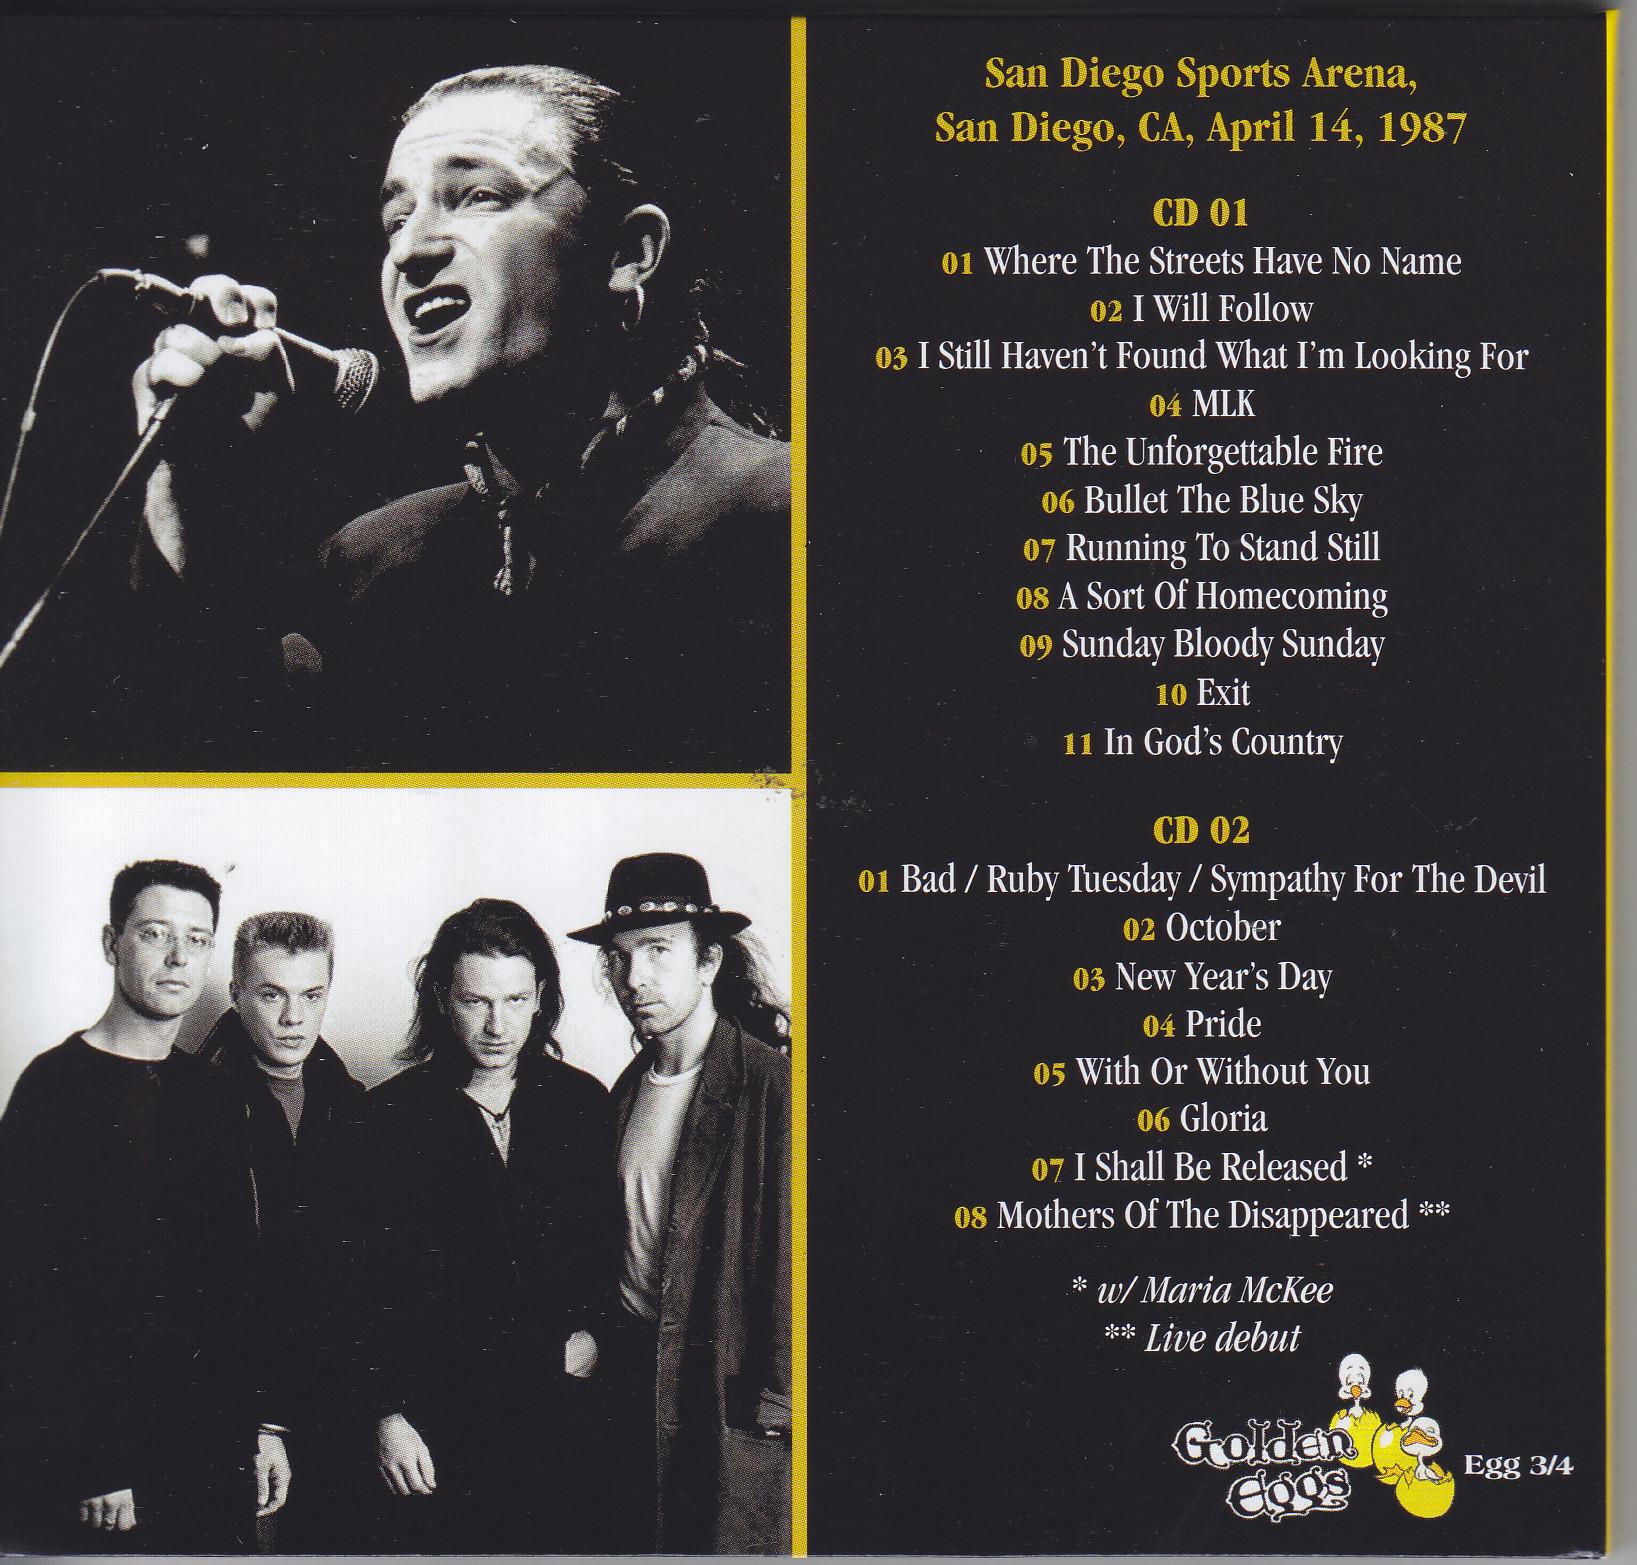 U2 / The Greatest Gift Is Gold San Diego 1987/ 2CD Digipak